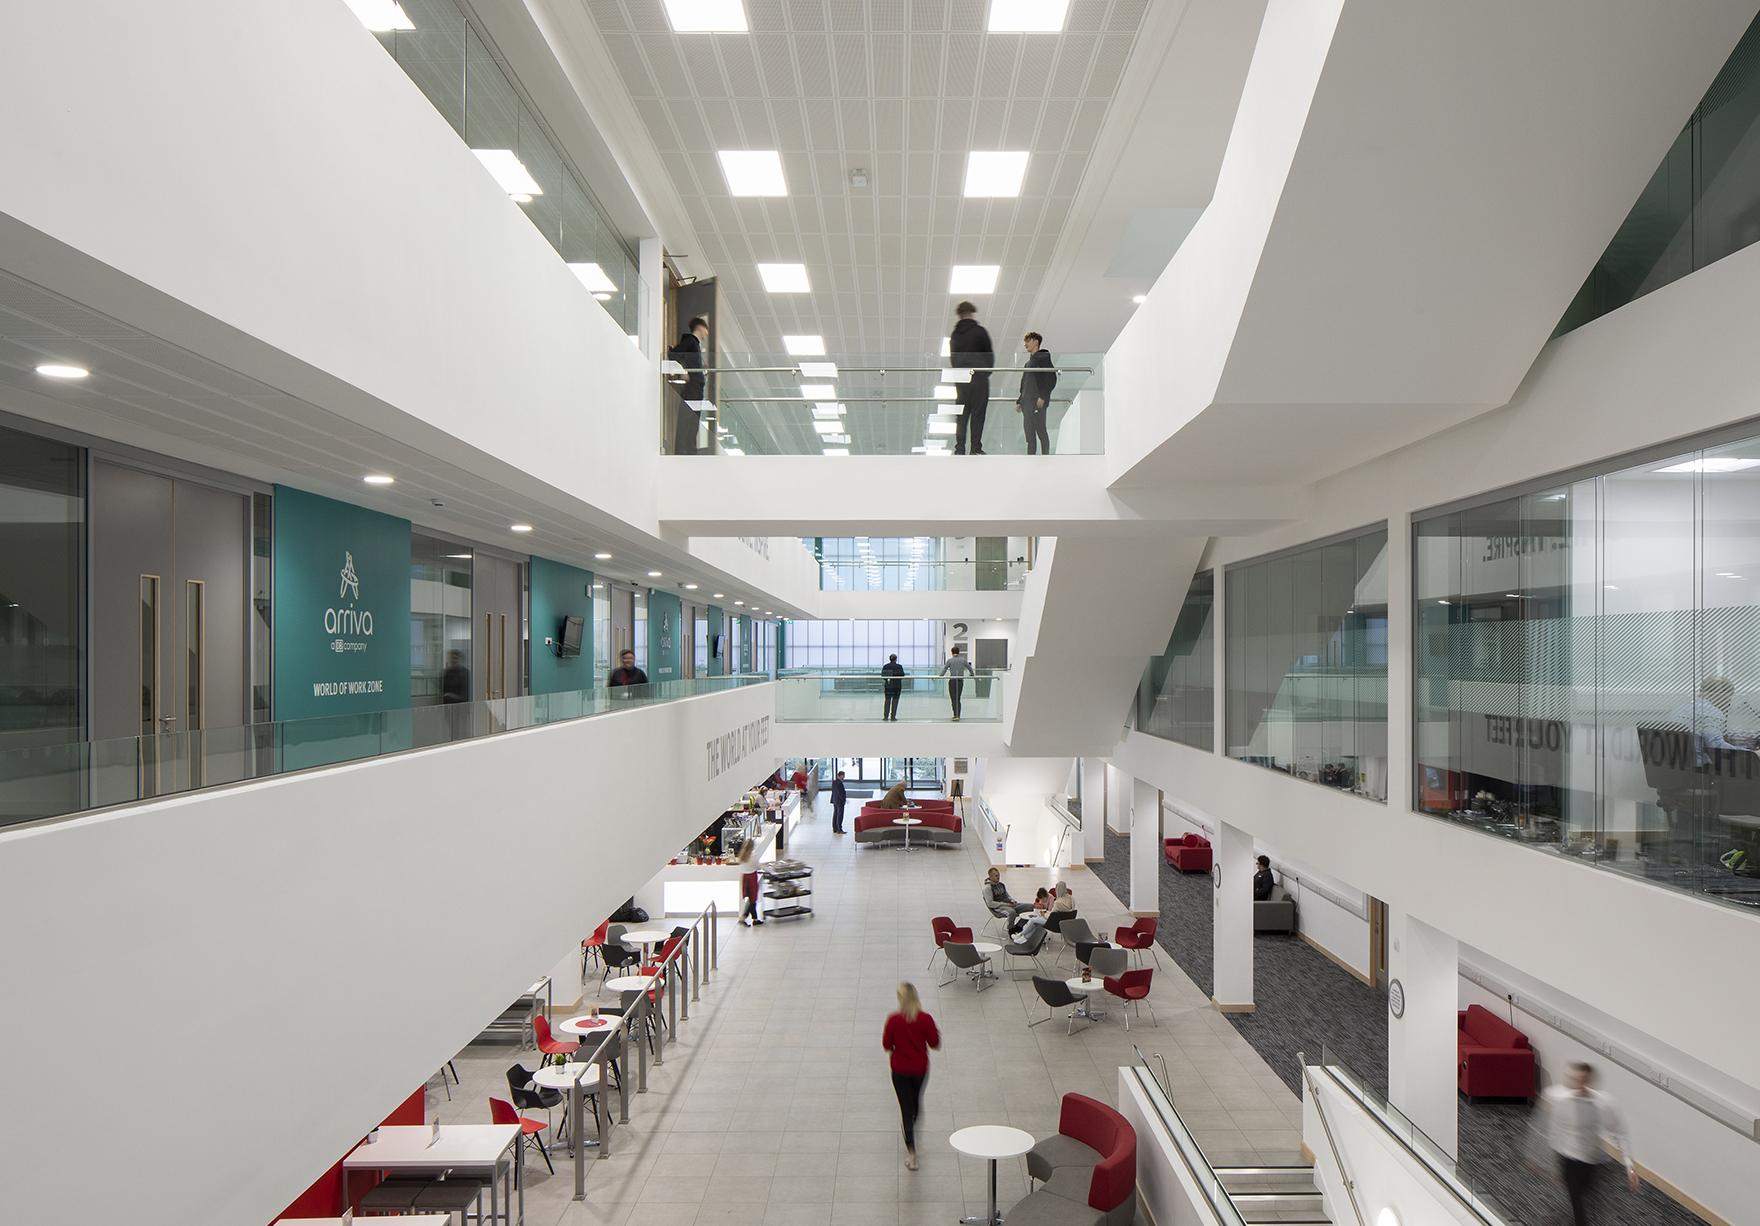 Beacon Of Light Sunderland Sport Education Workplace Football Barn Faulknerbrowns Architects Lh